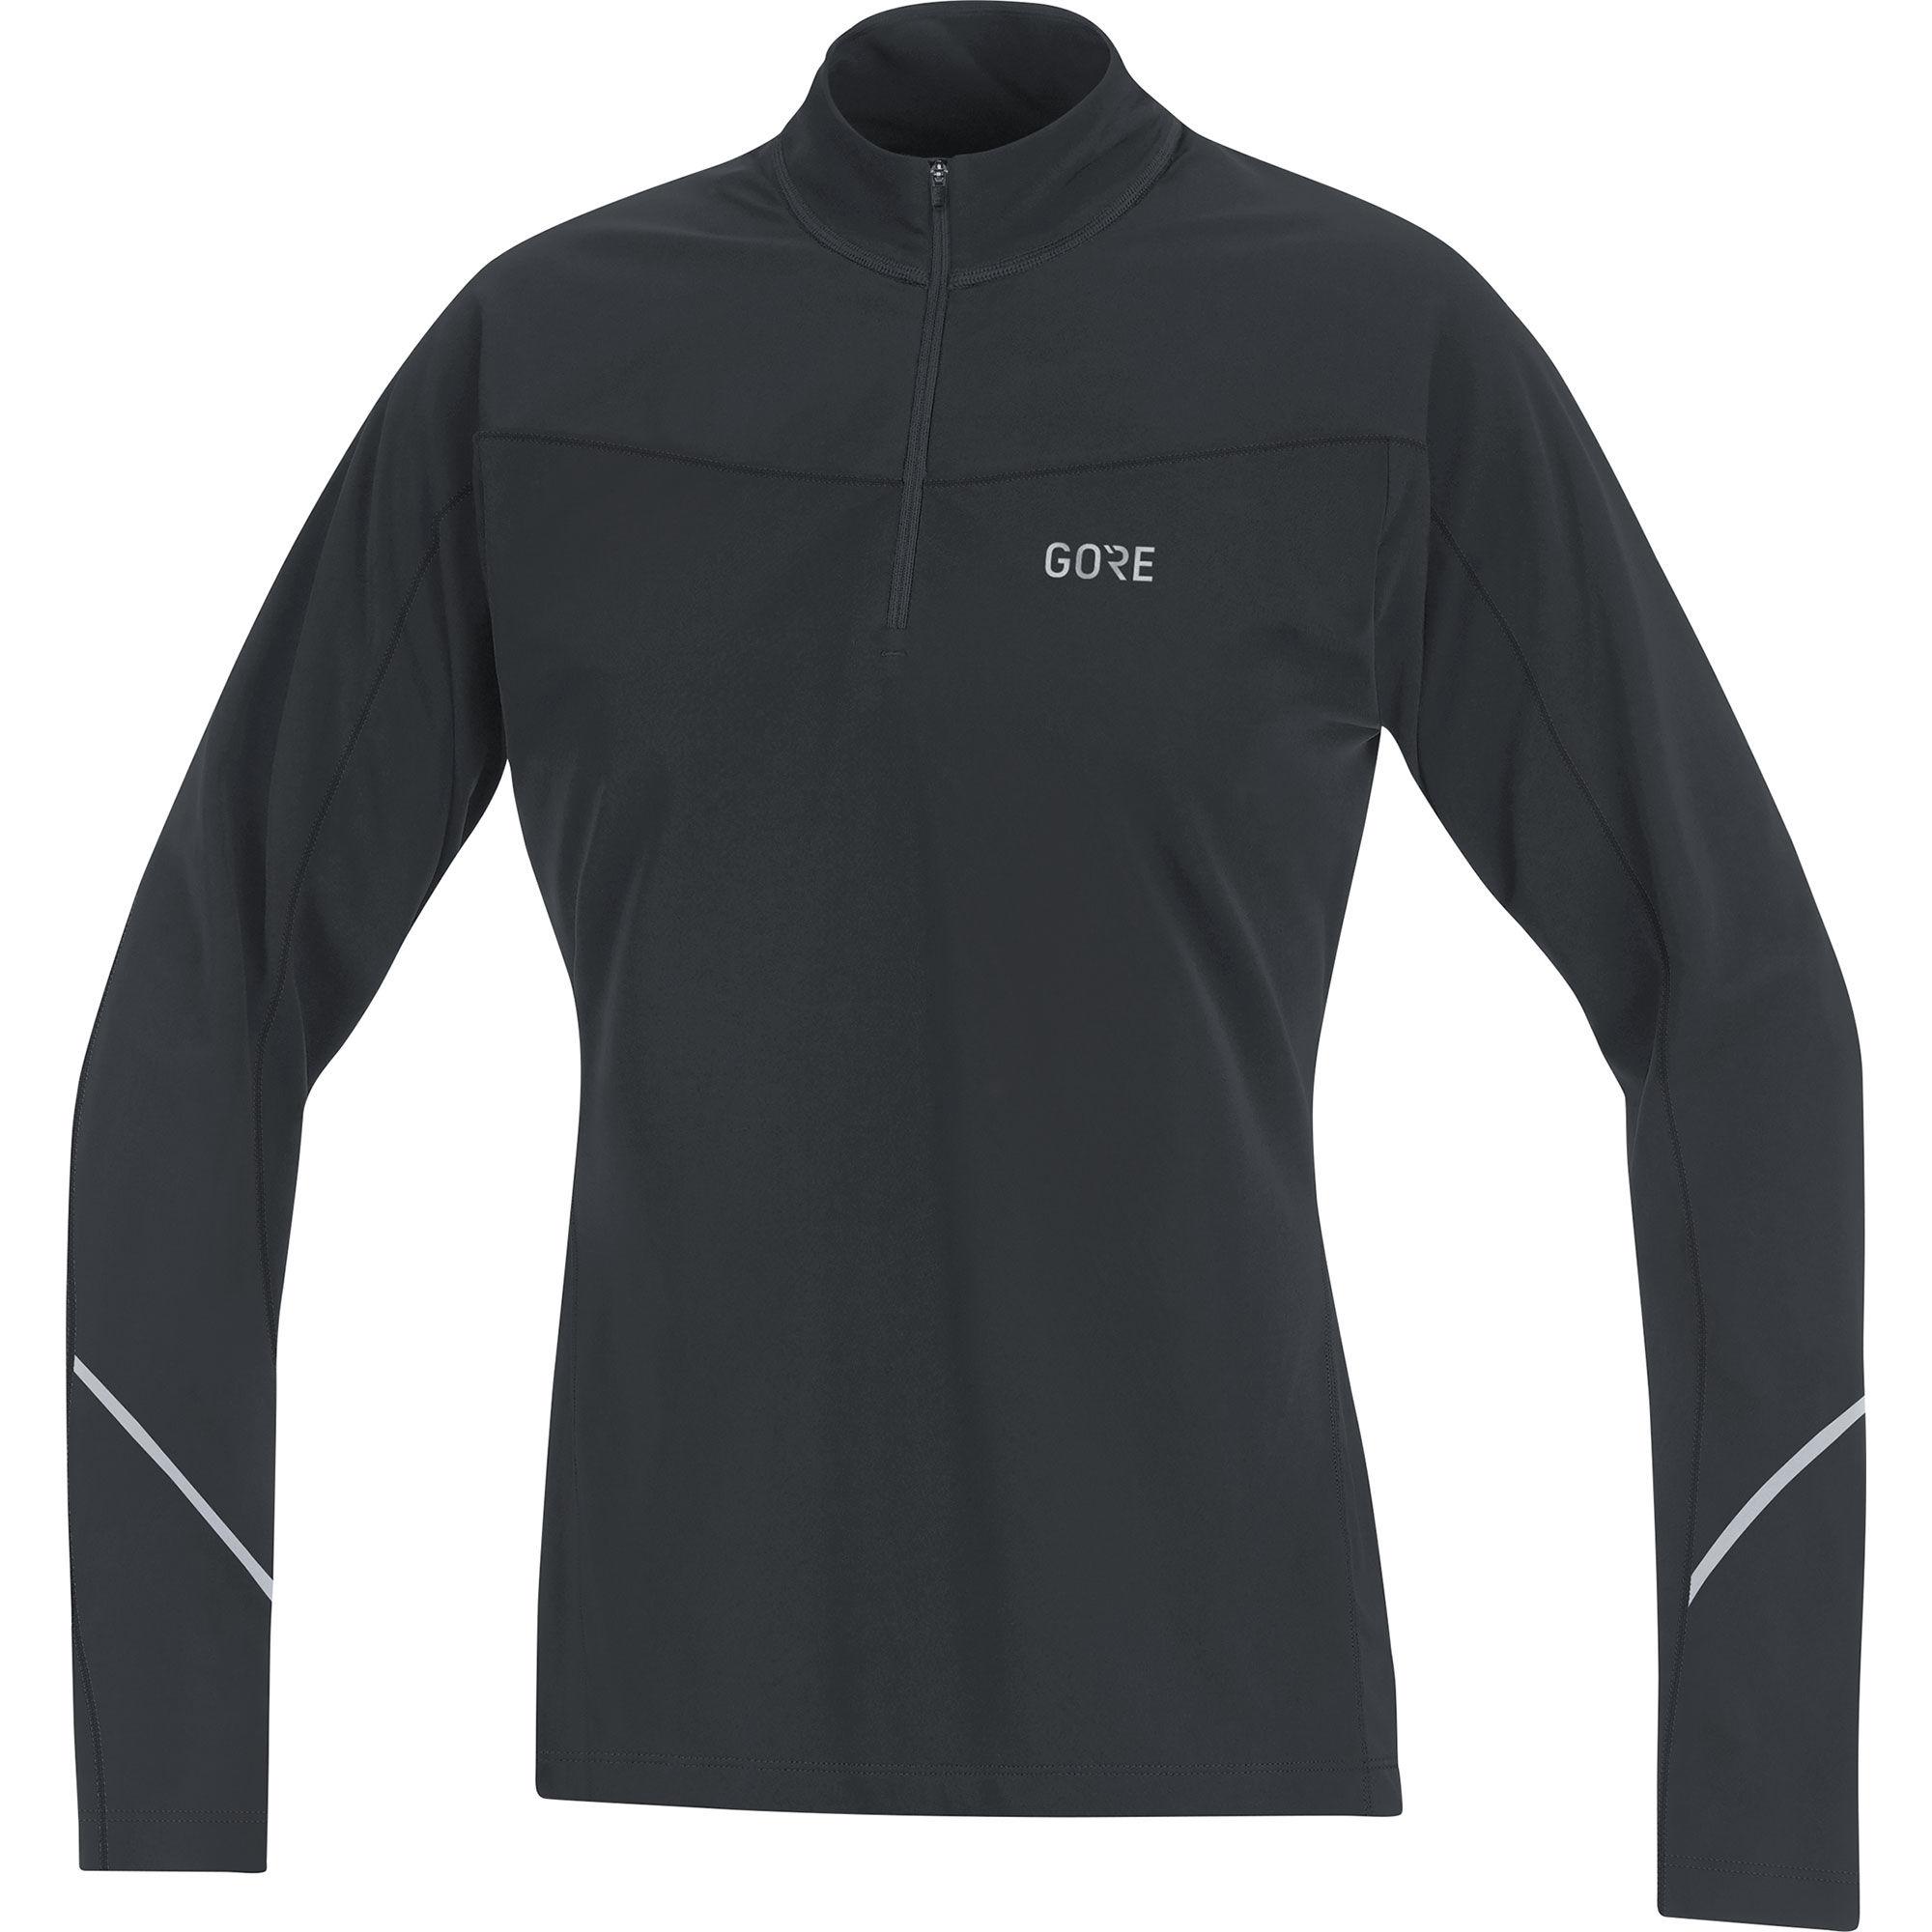 Gore R3 Lady Thermo Zip Shirt Langarm in Schwarz